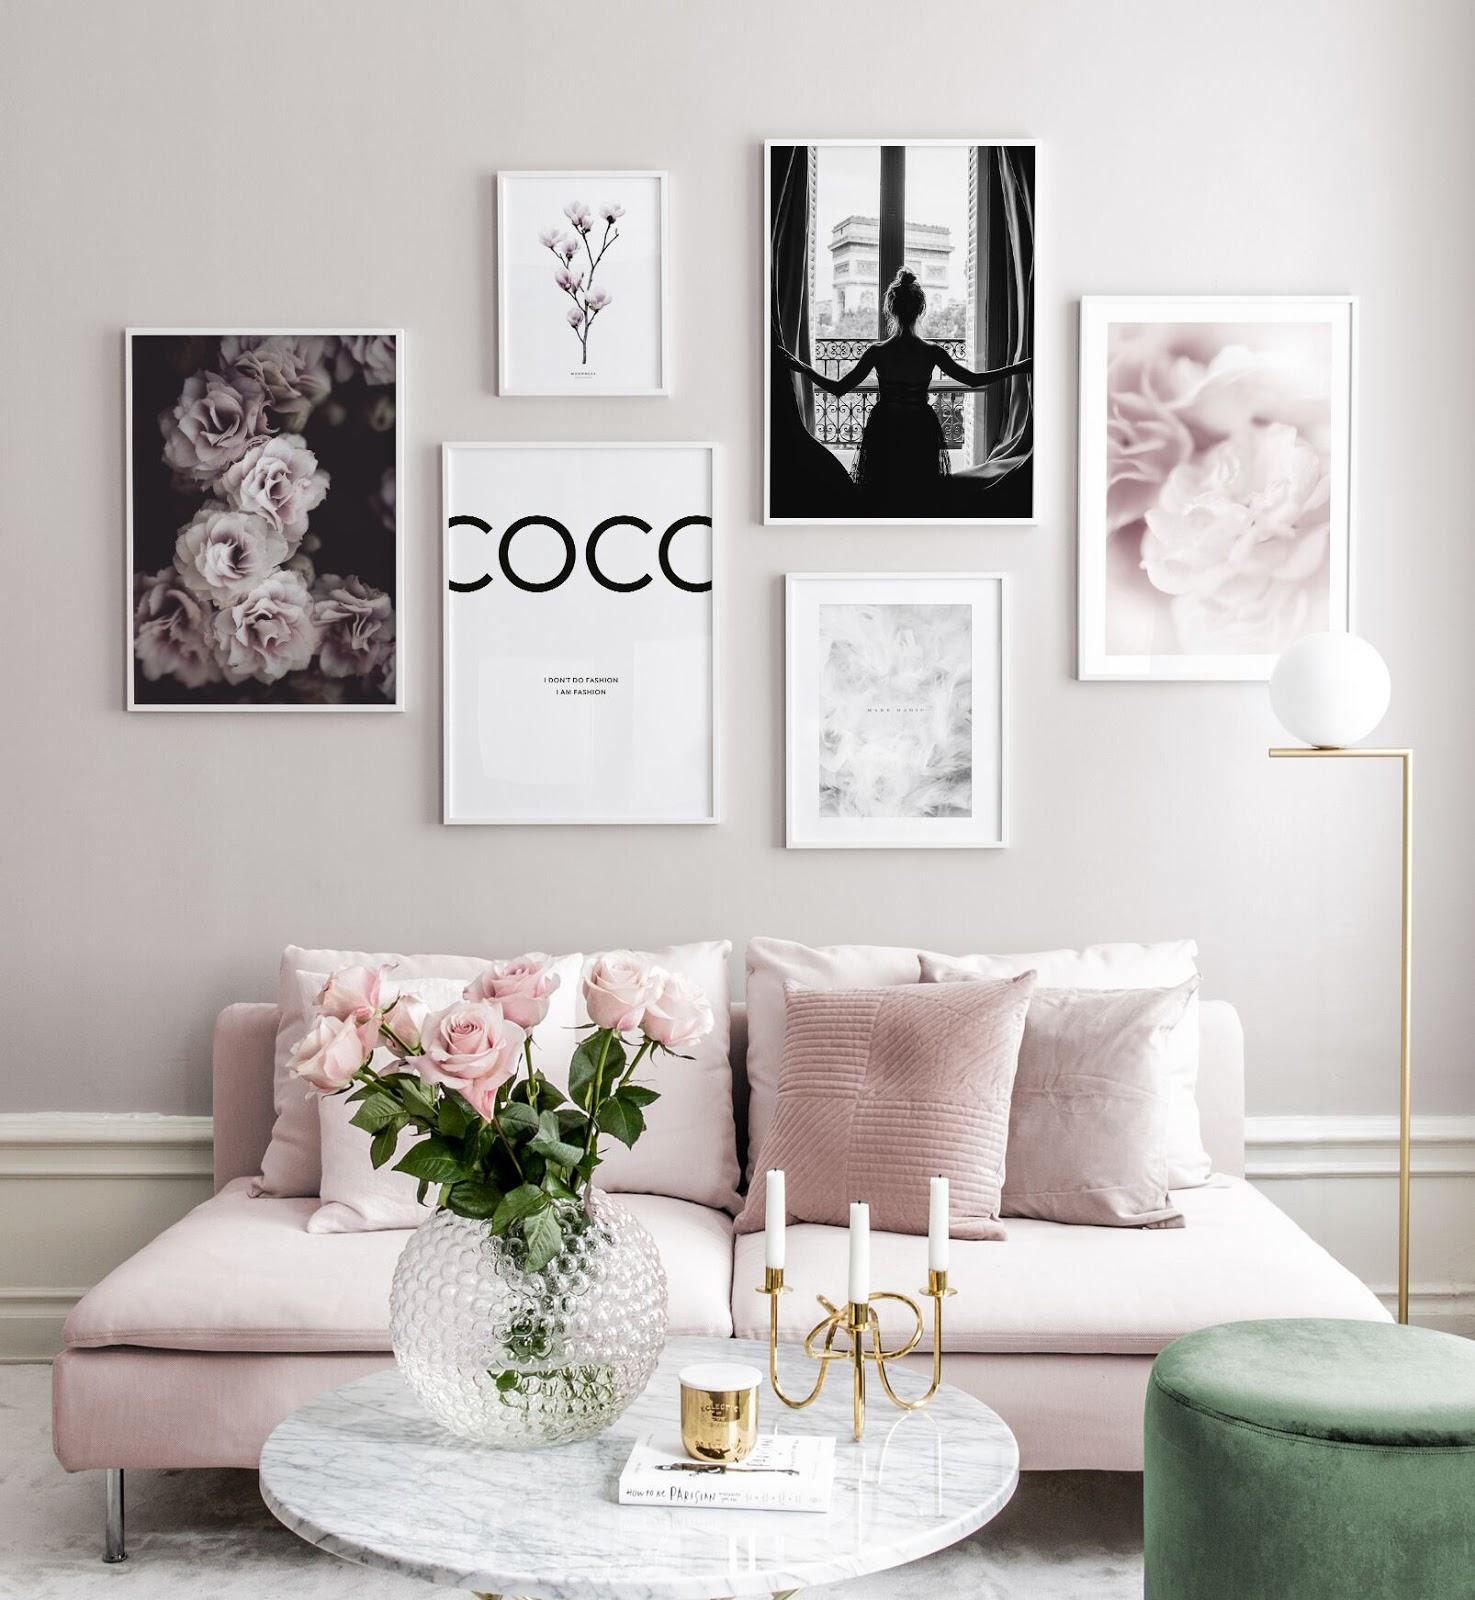 Poster Store: arredare casa con una gallery wall